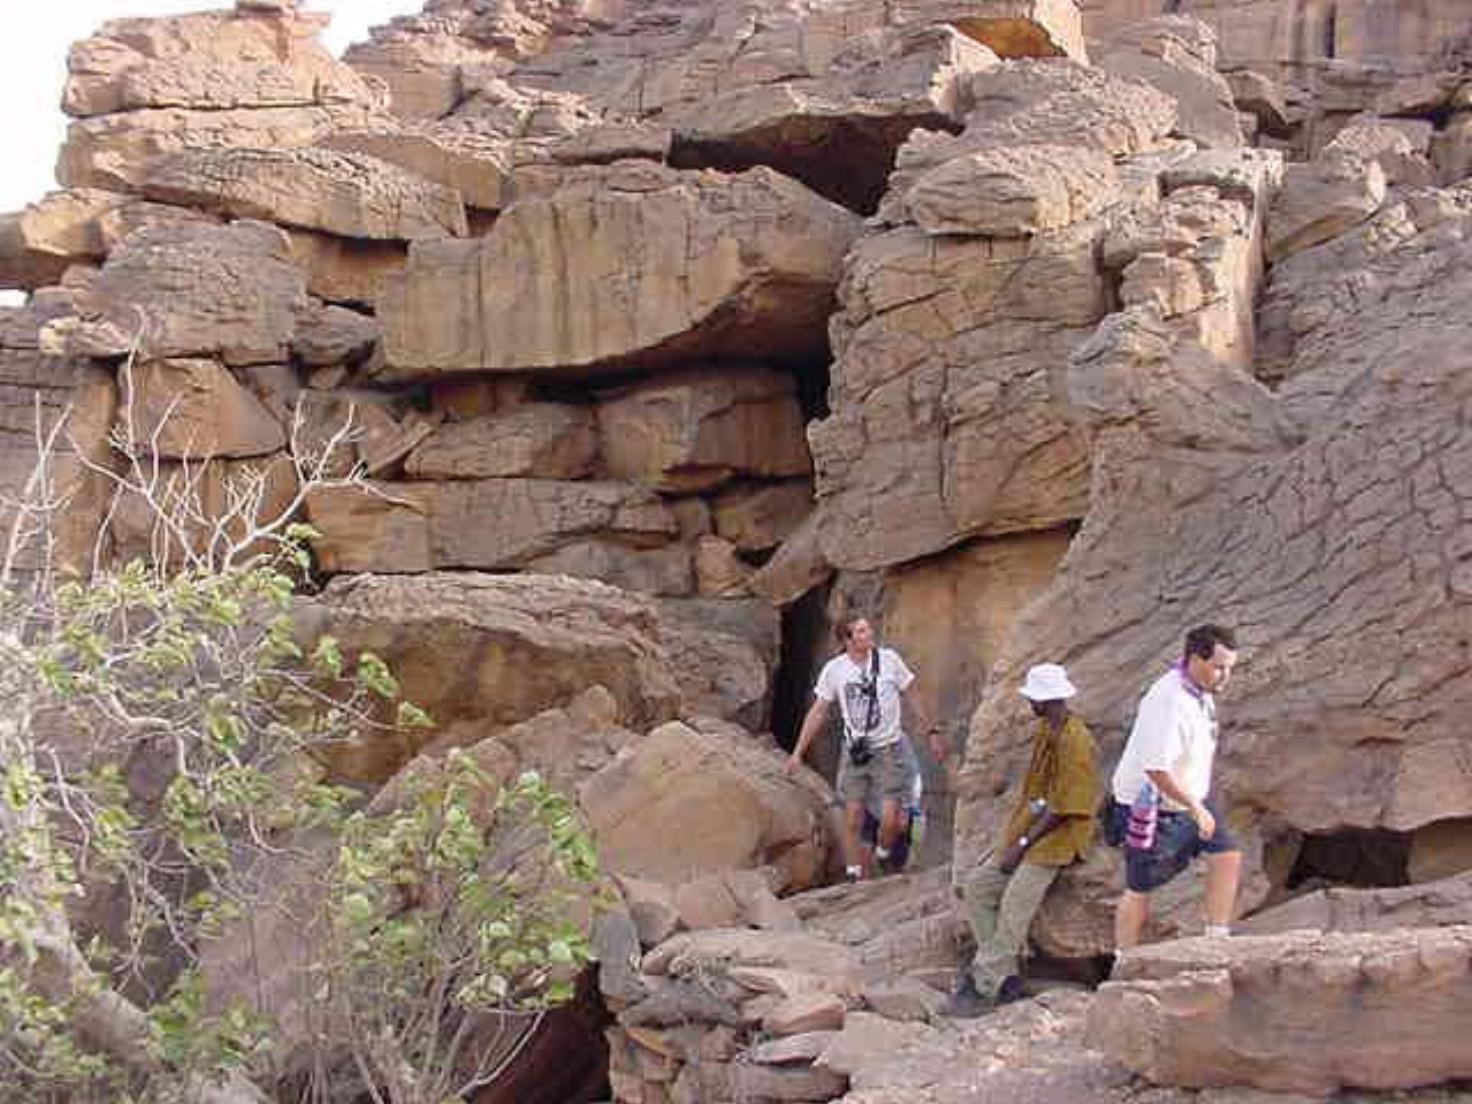 The group hikes around Dogon